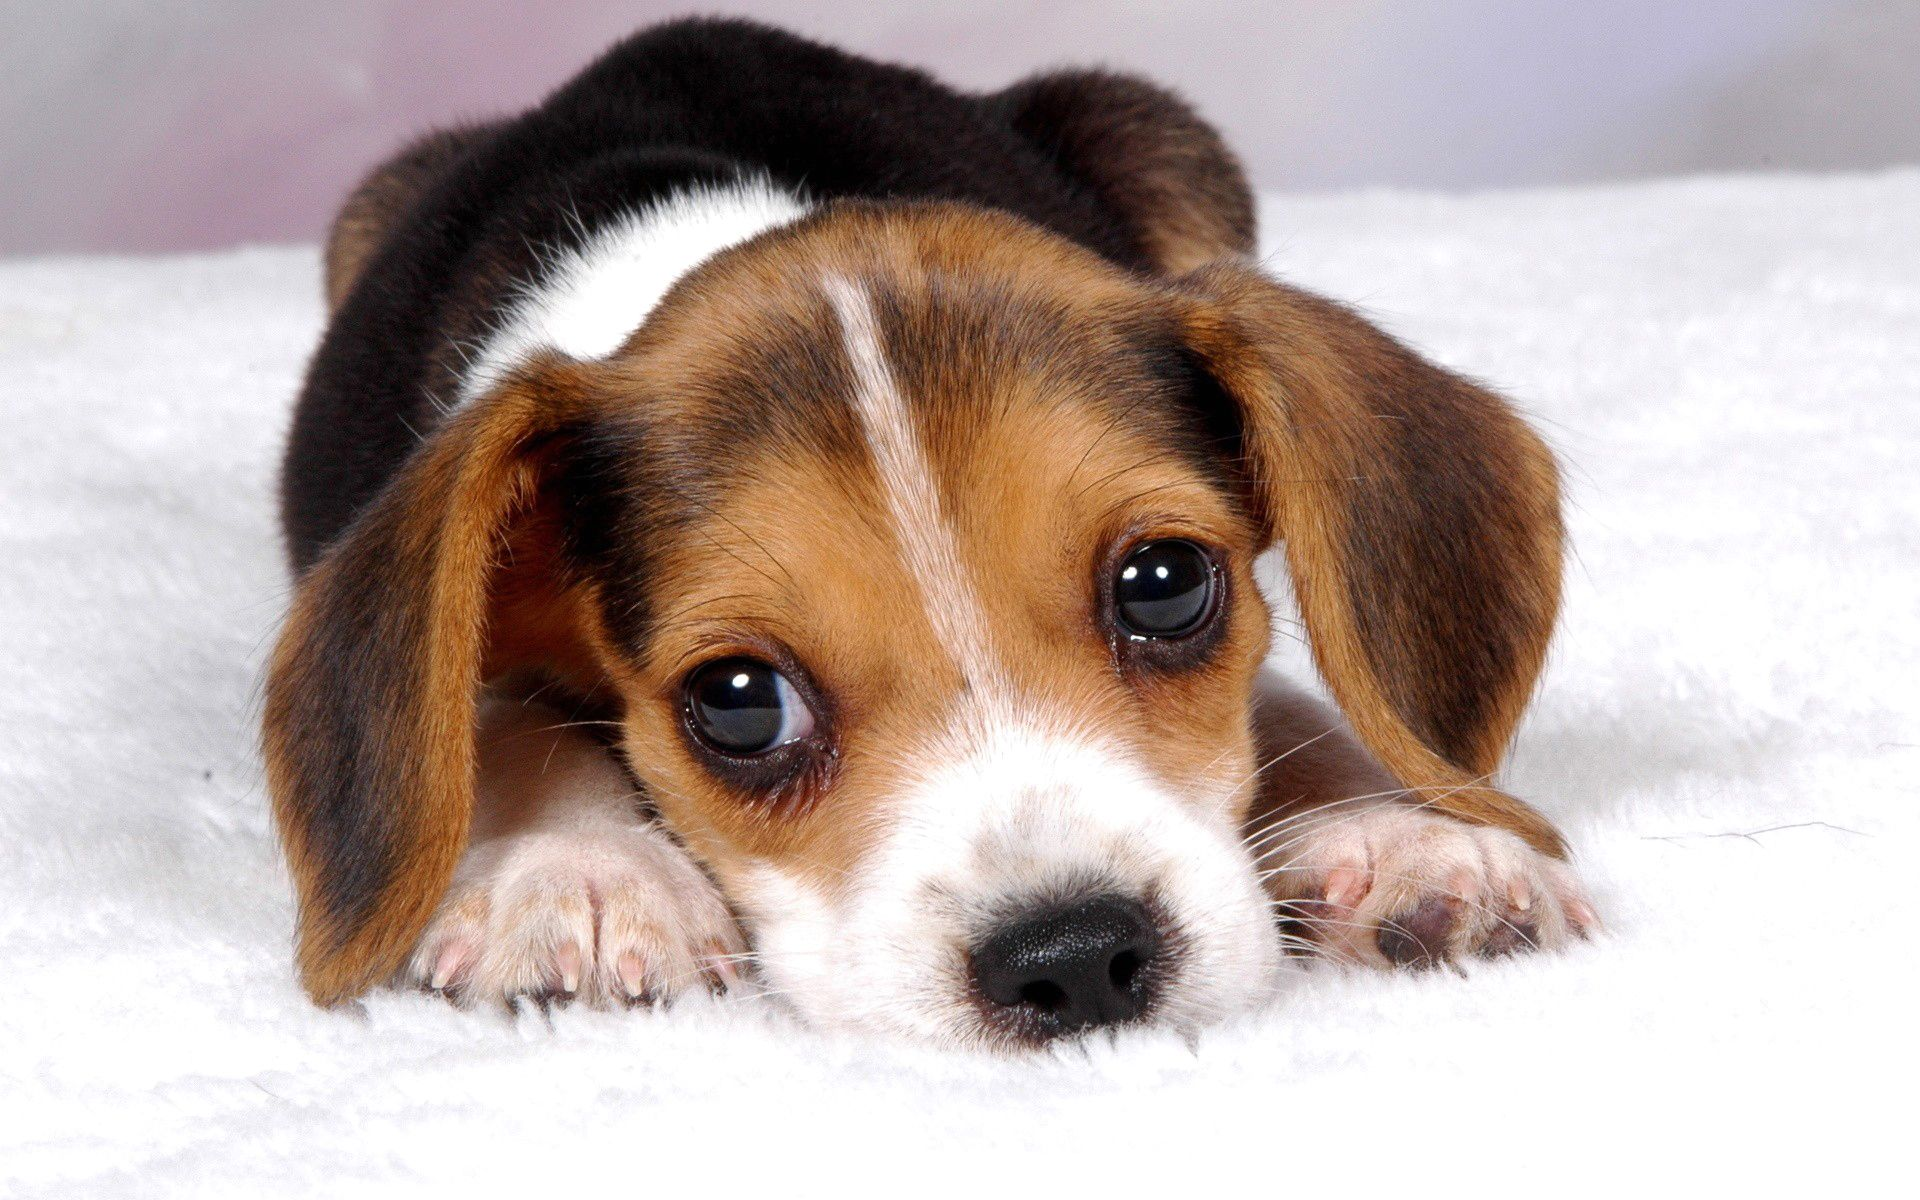 Cute Puppy Baby Dog Wallpaper Hd 8 Cute Beagles Beagle Puppy